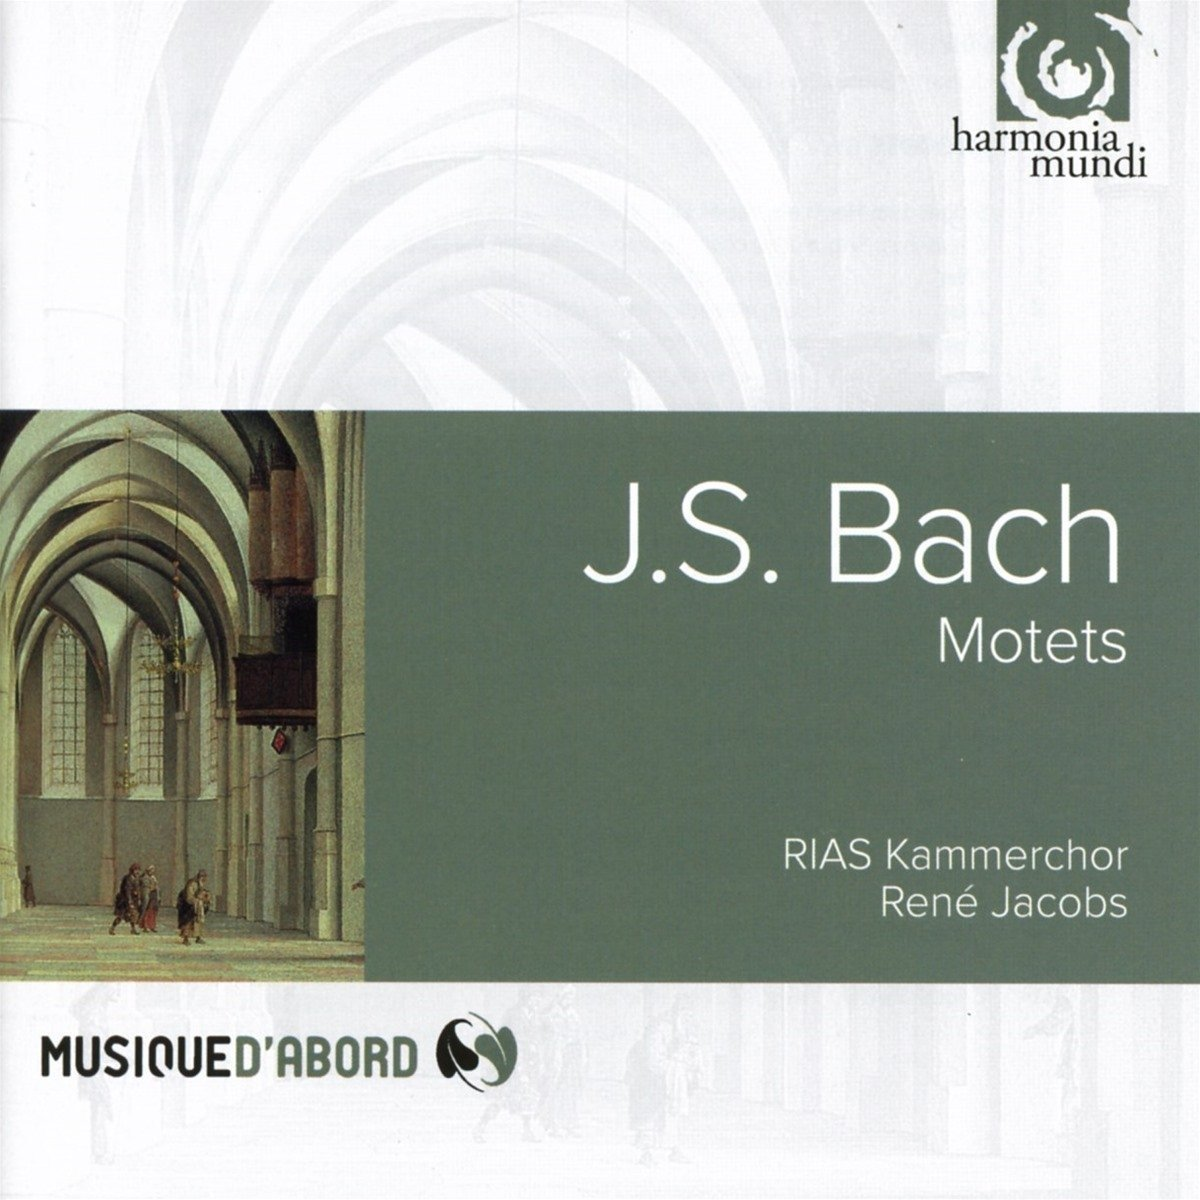 Rene Jacobs & RIAS-Kammerchor & Akademie fur Alte Musik